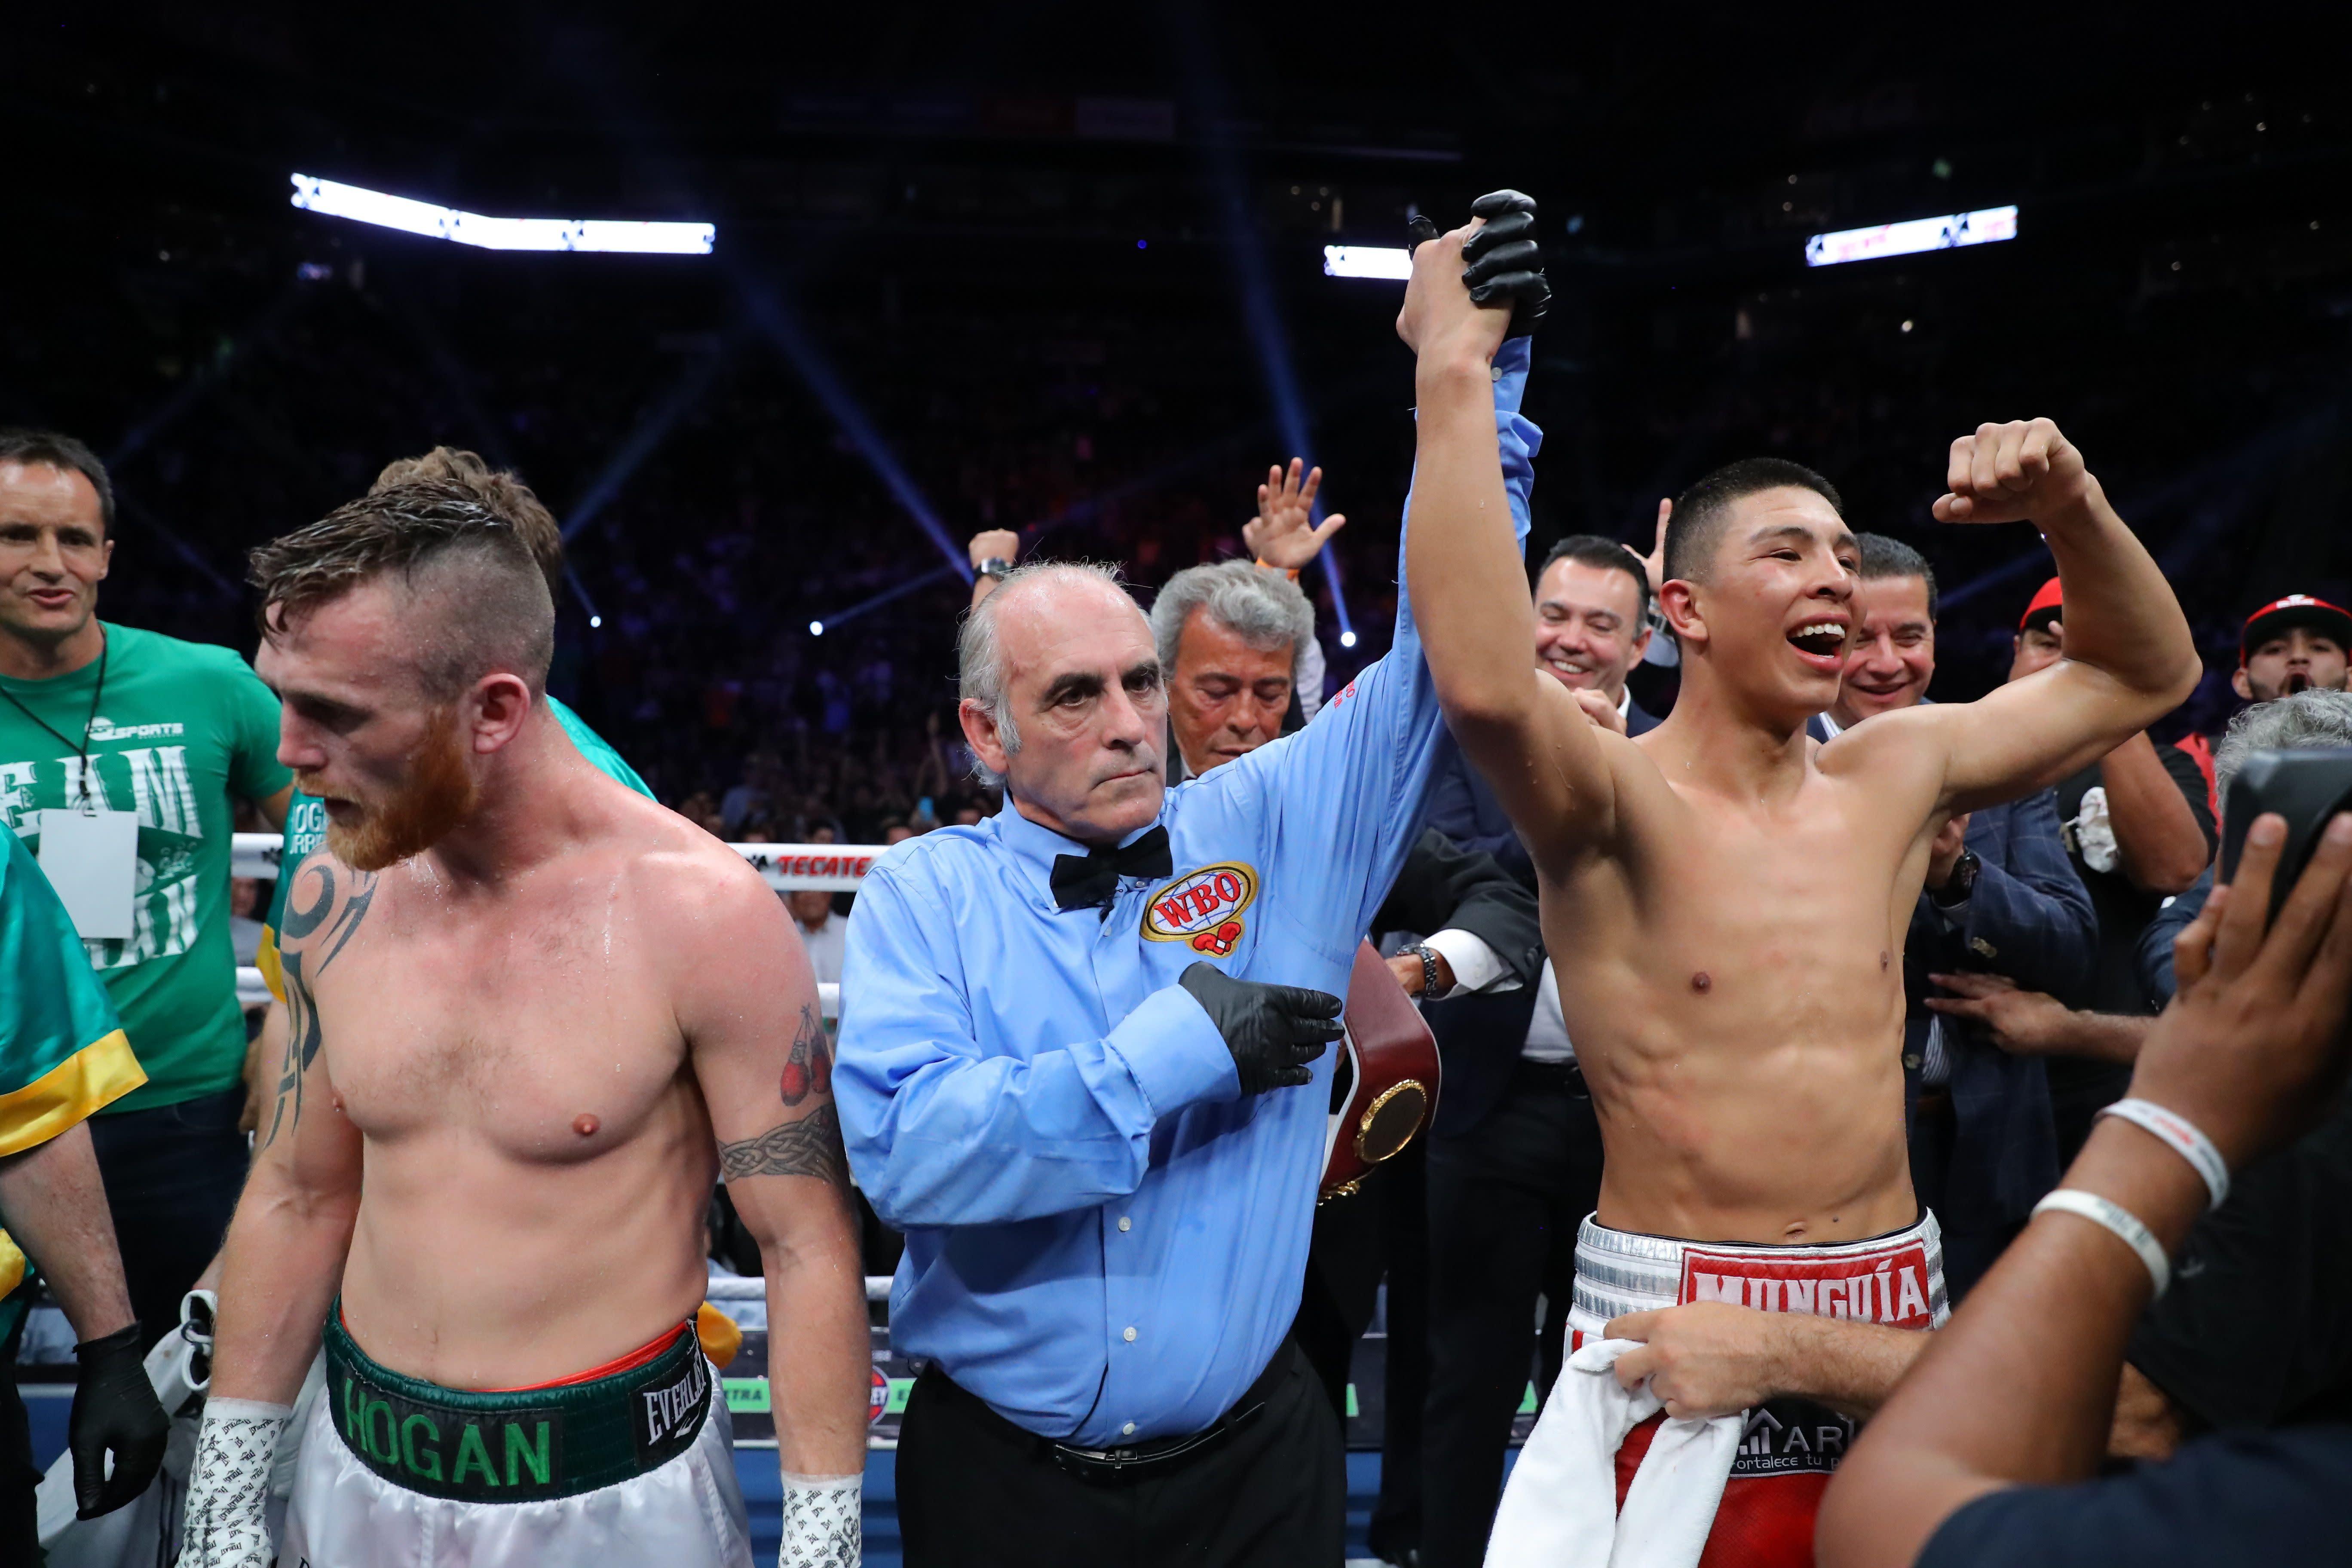 Jaime Munguia (R) celebrates his victory over Dennis Hogan on April 13, 2019 at Arena Monterrey in Monterrey, Mexico. (Getty Images)